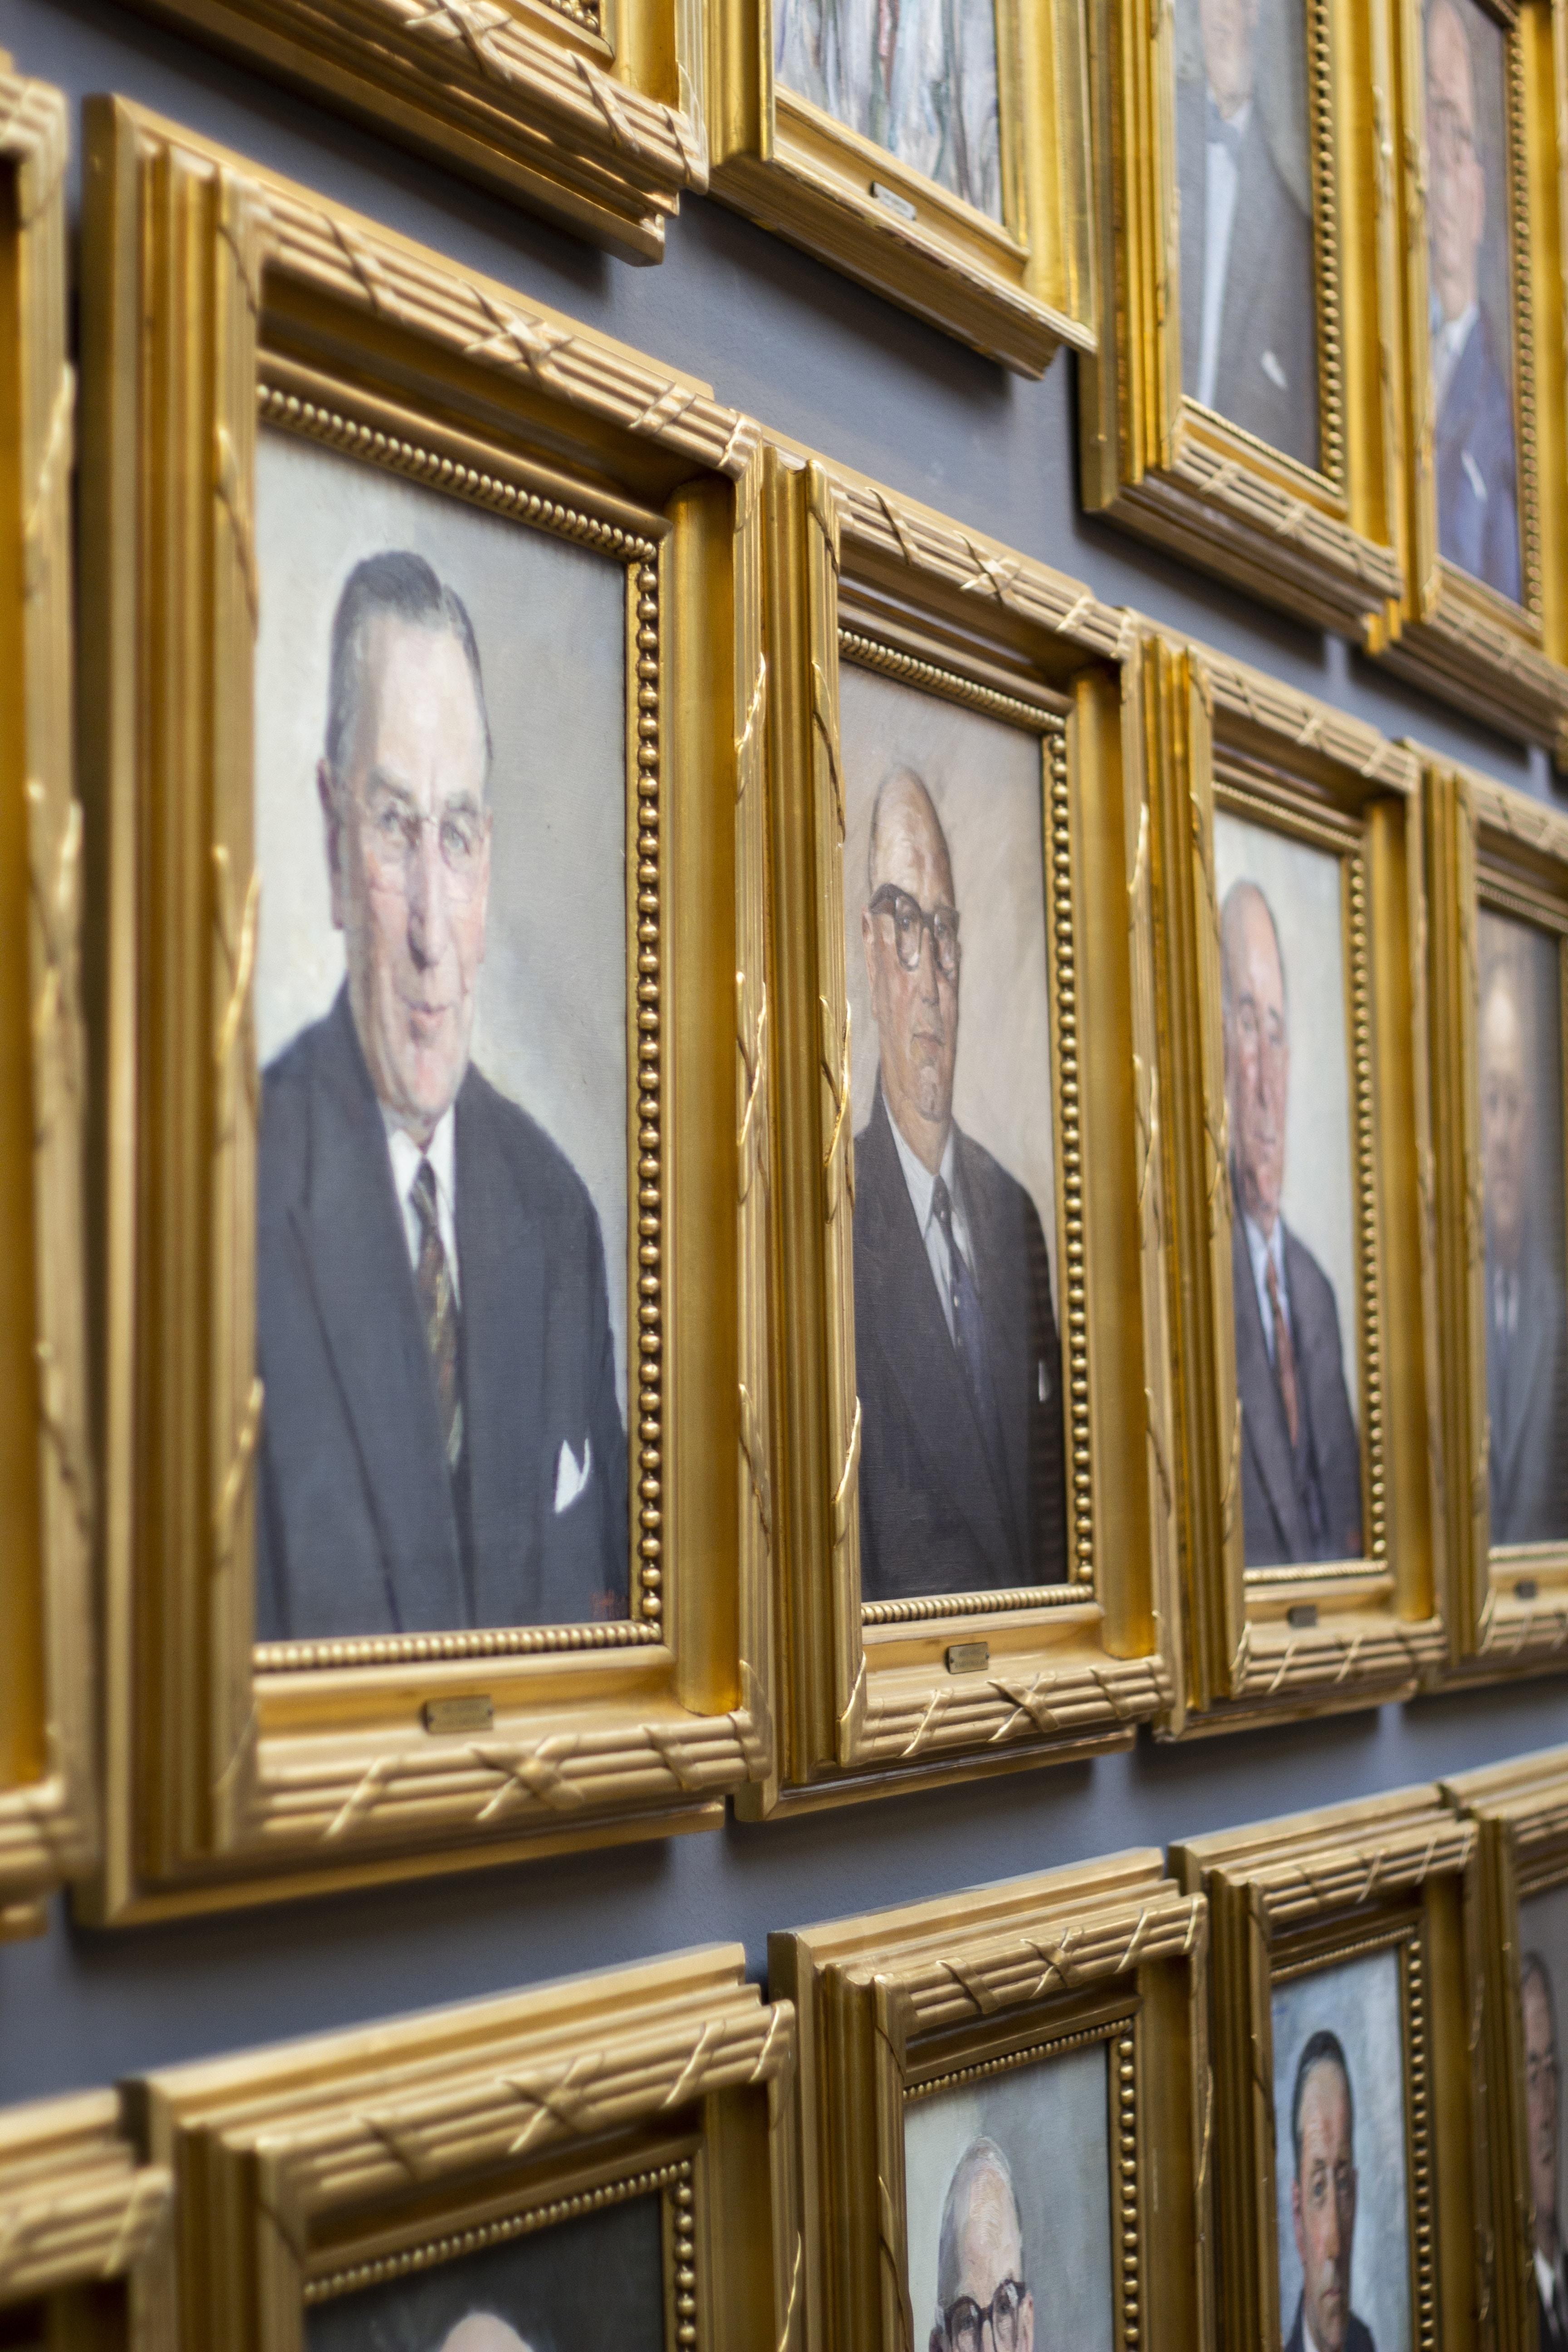 brown wooden photo frames of men